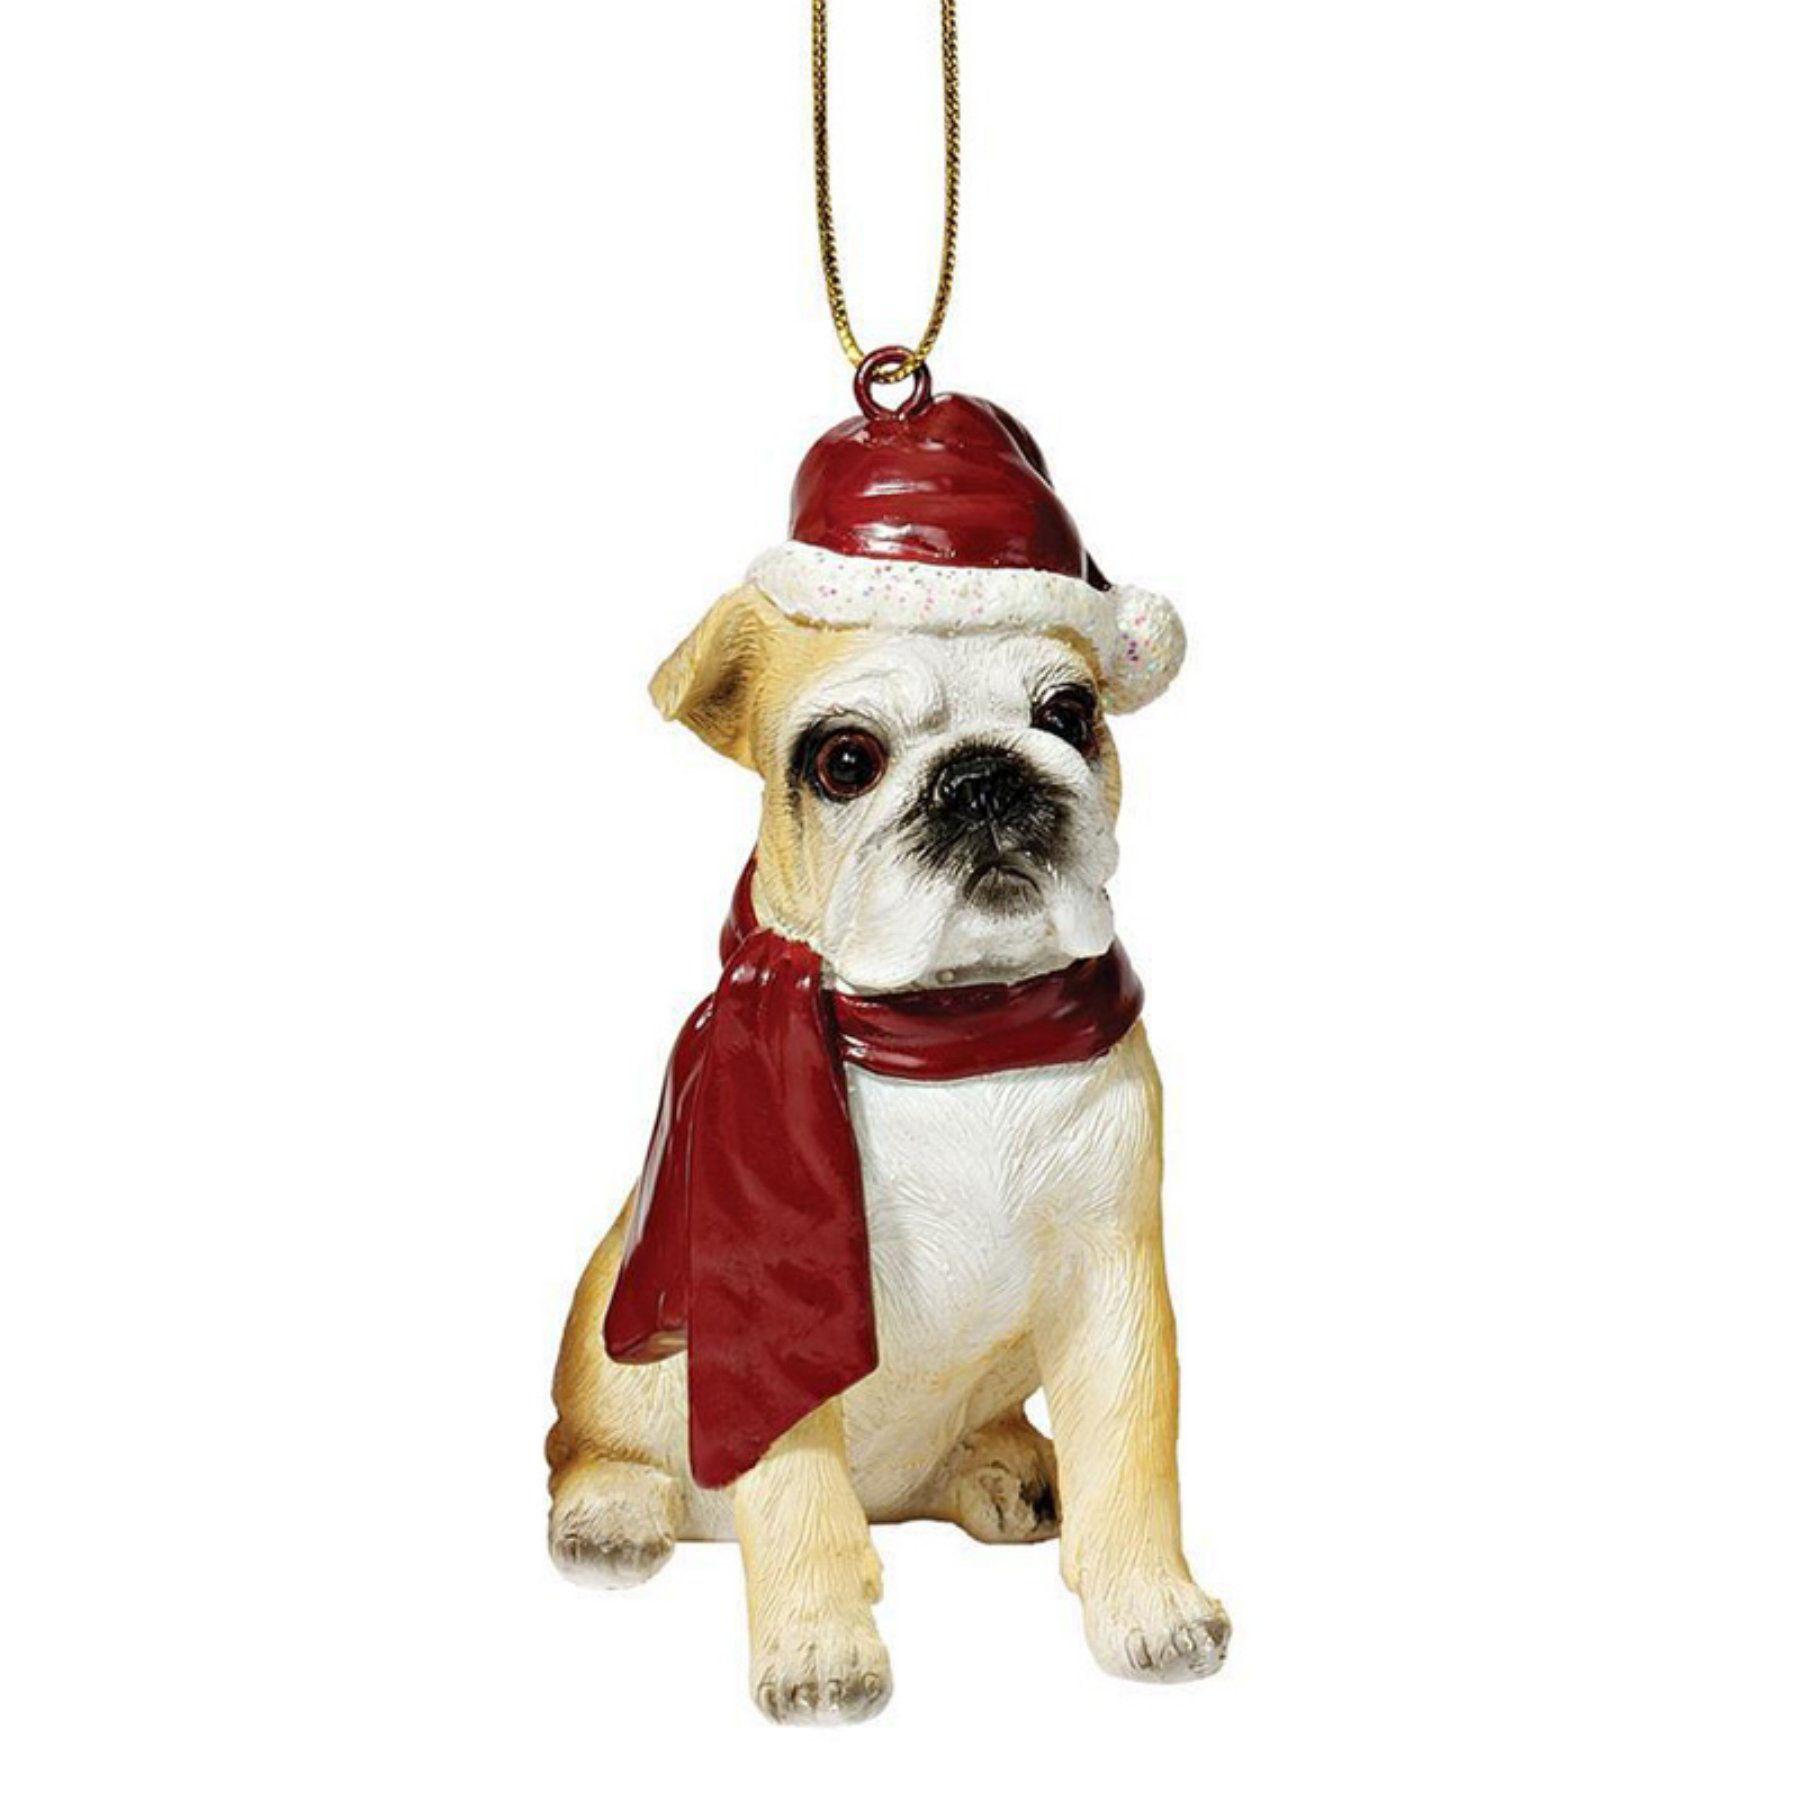 055b607f439 Design Toscano Bulldog Holiday Dog Ornament - JH576304